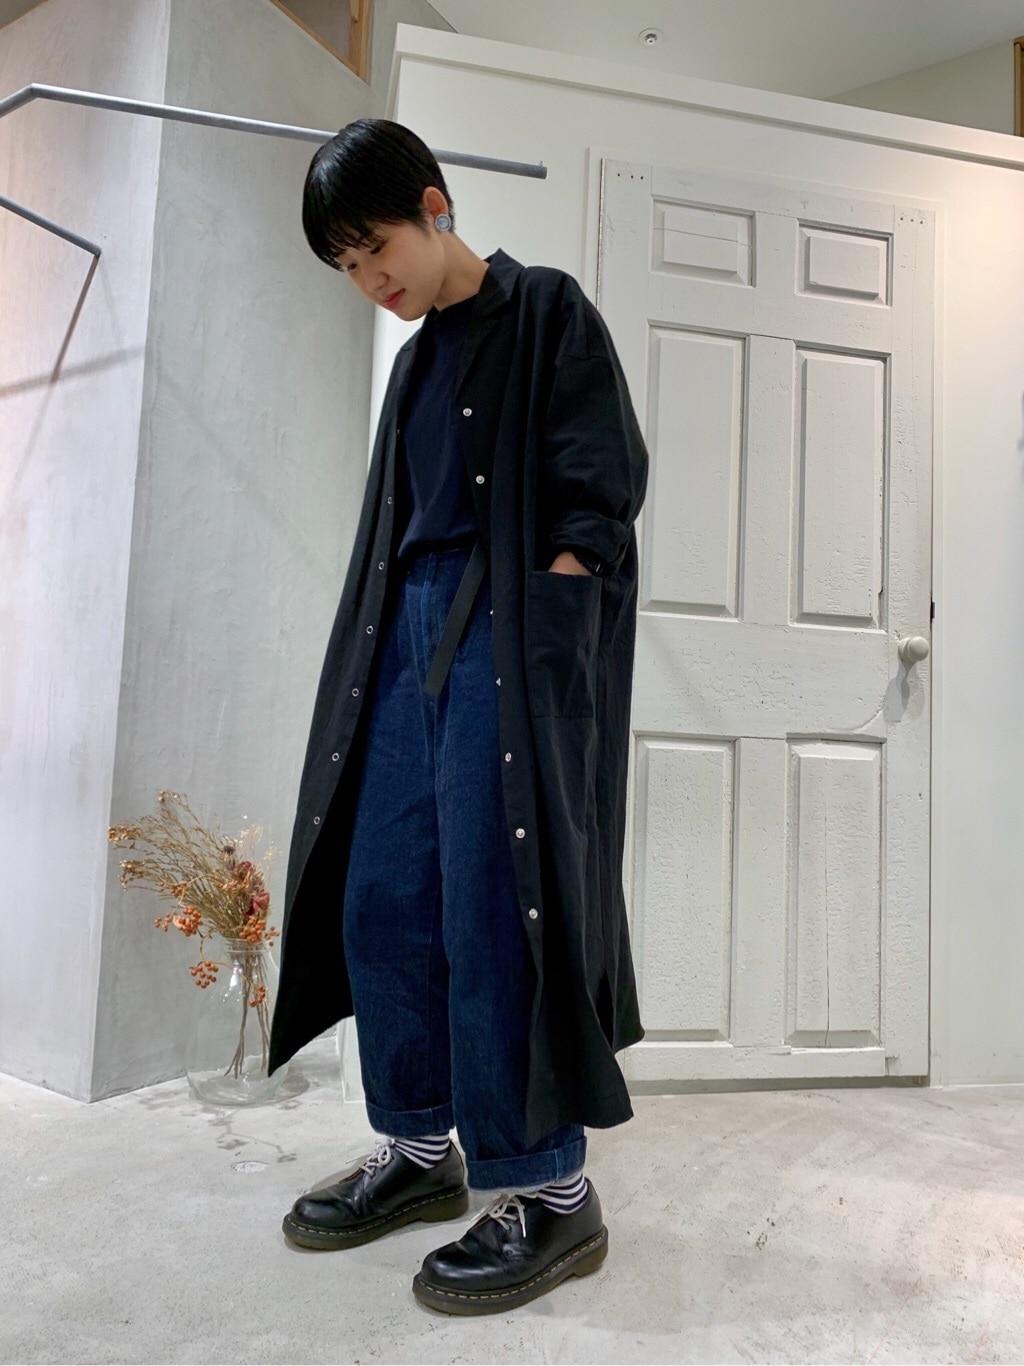 bulle de savon 吉祥寺パルコ 身長:154cm 2019.08.29